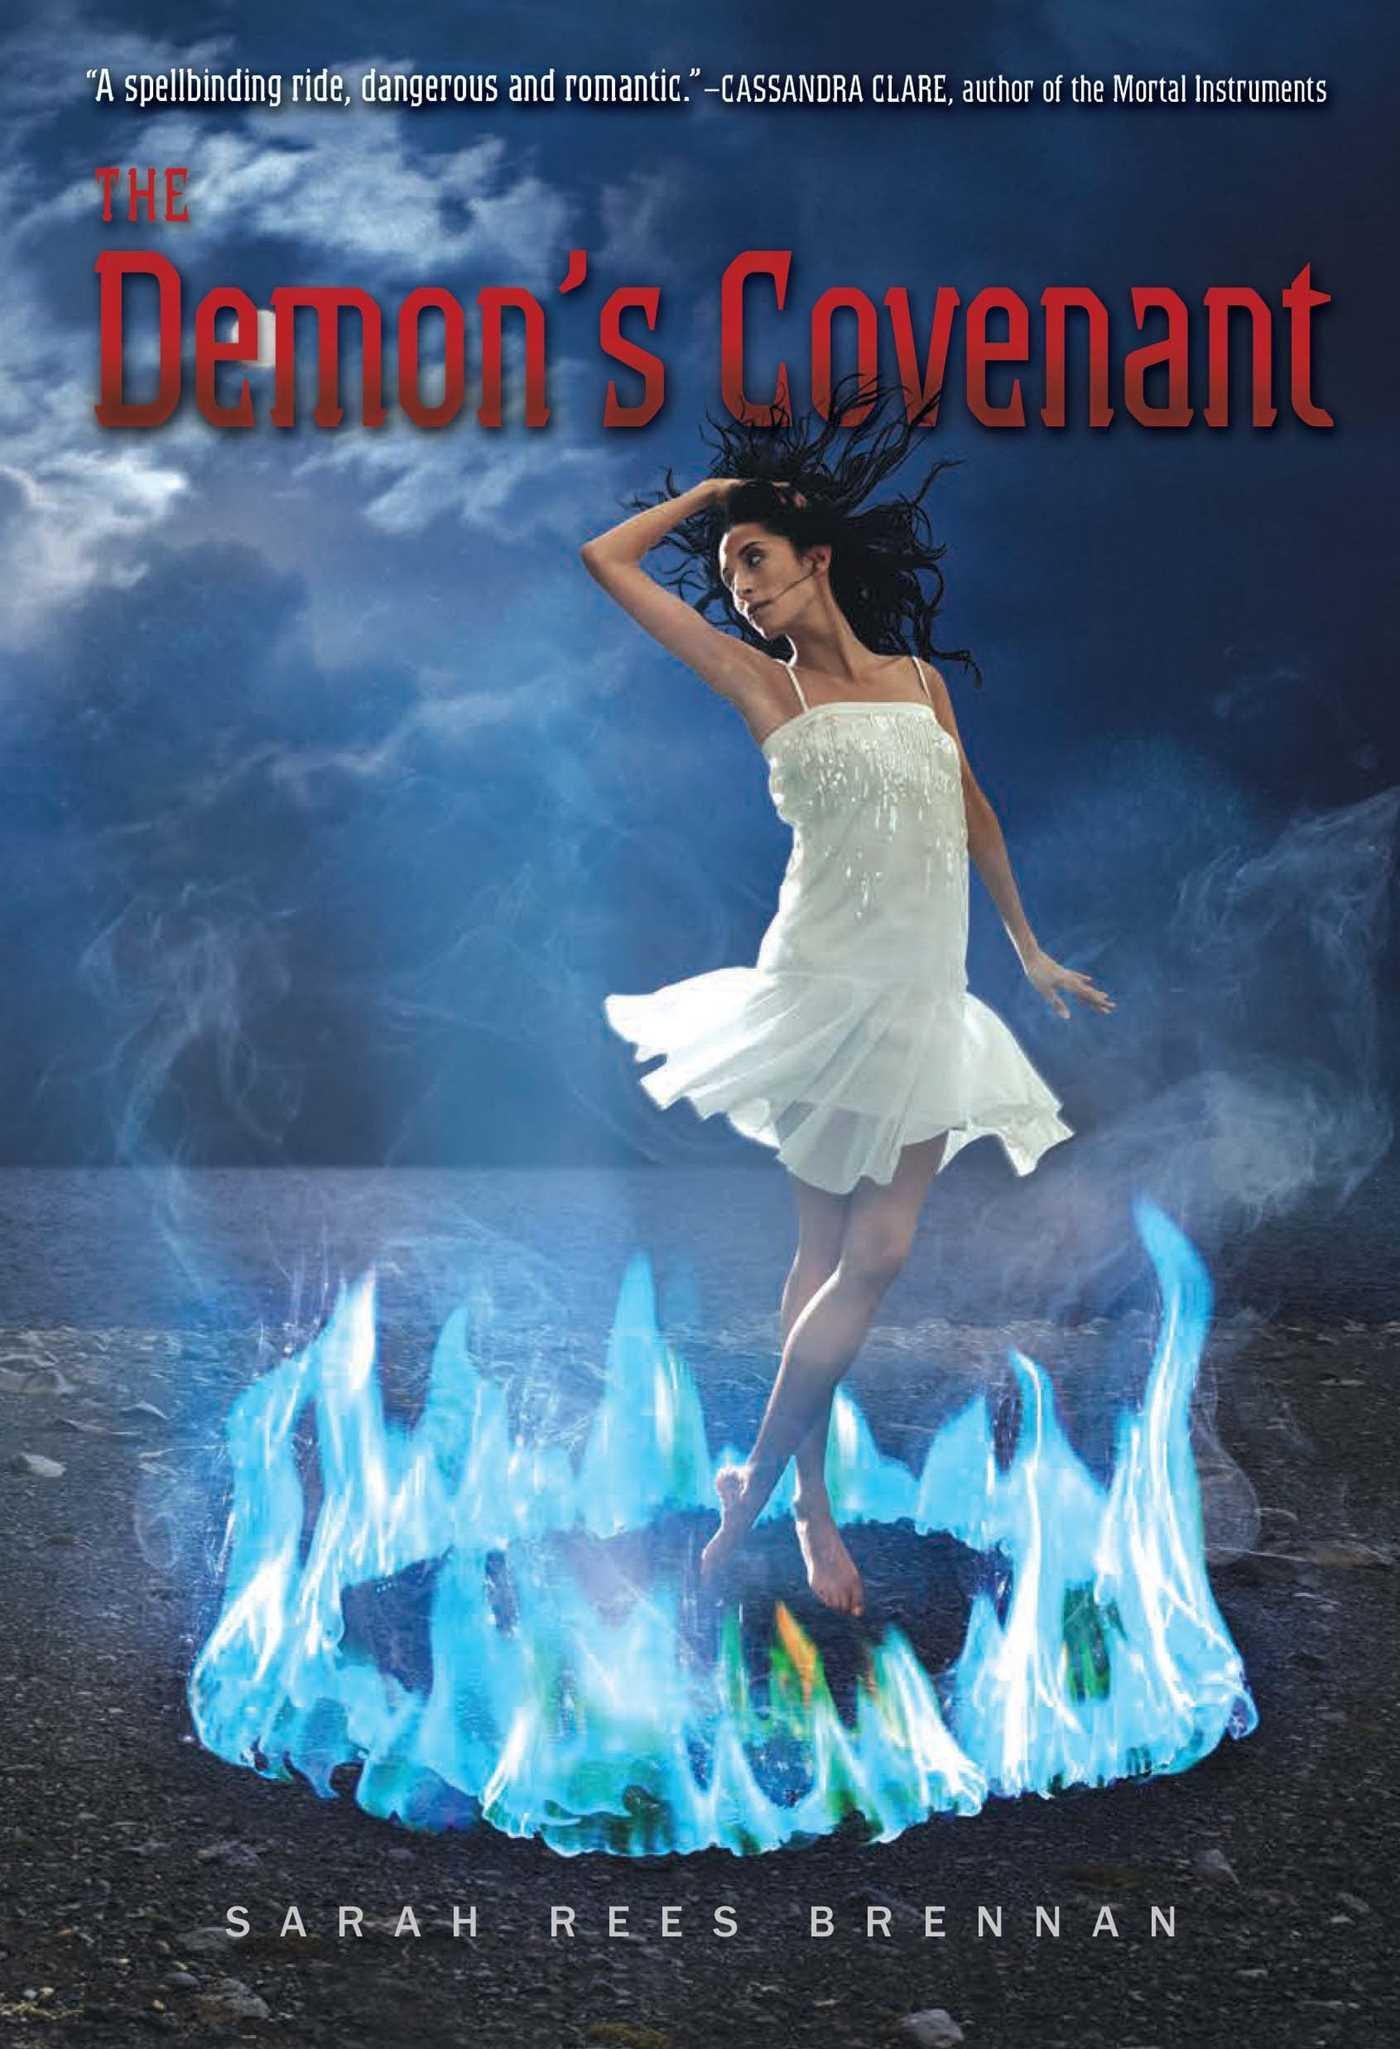 The Demon's Covenant (The Demon's Lexicon Trilogy) ebook